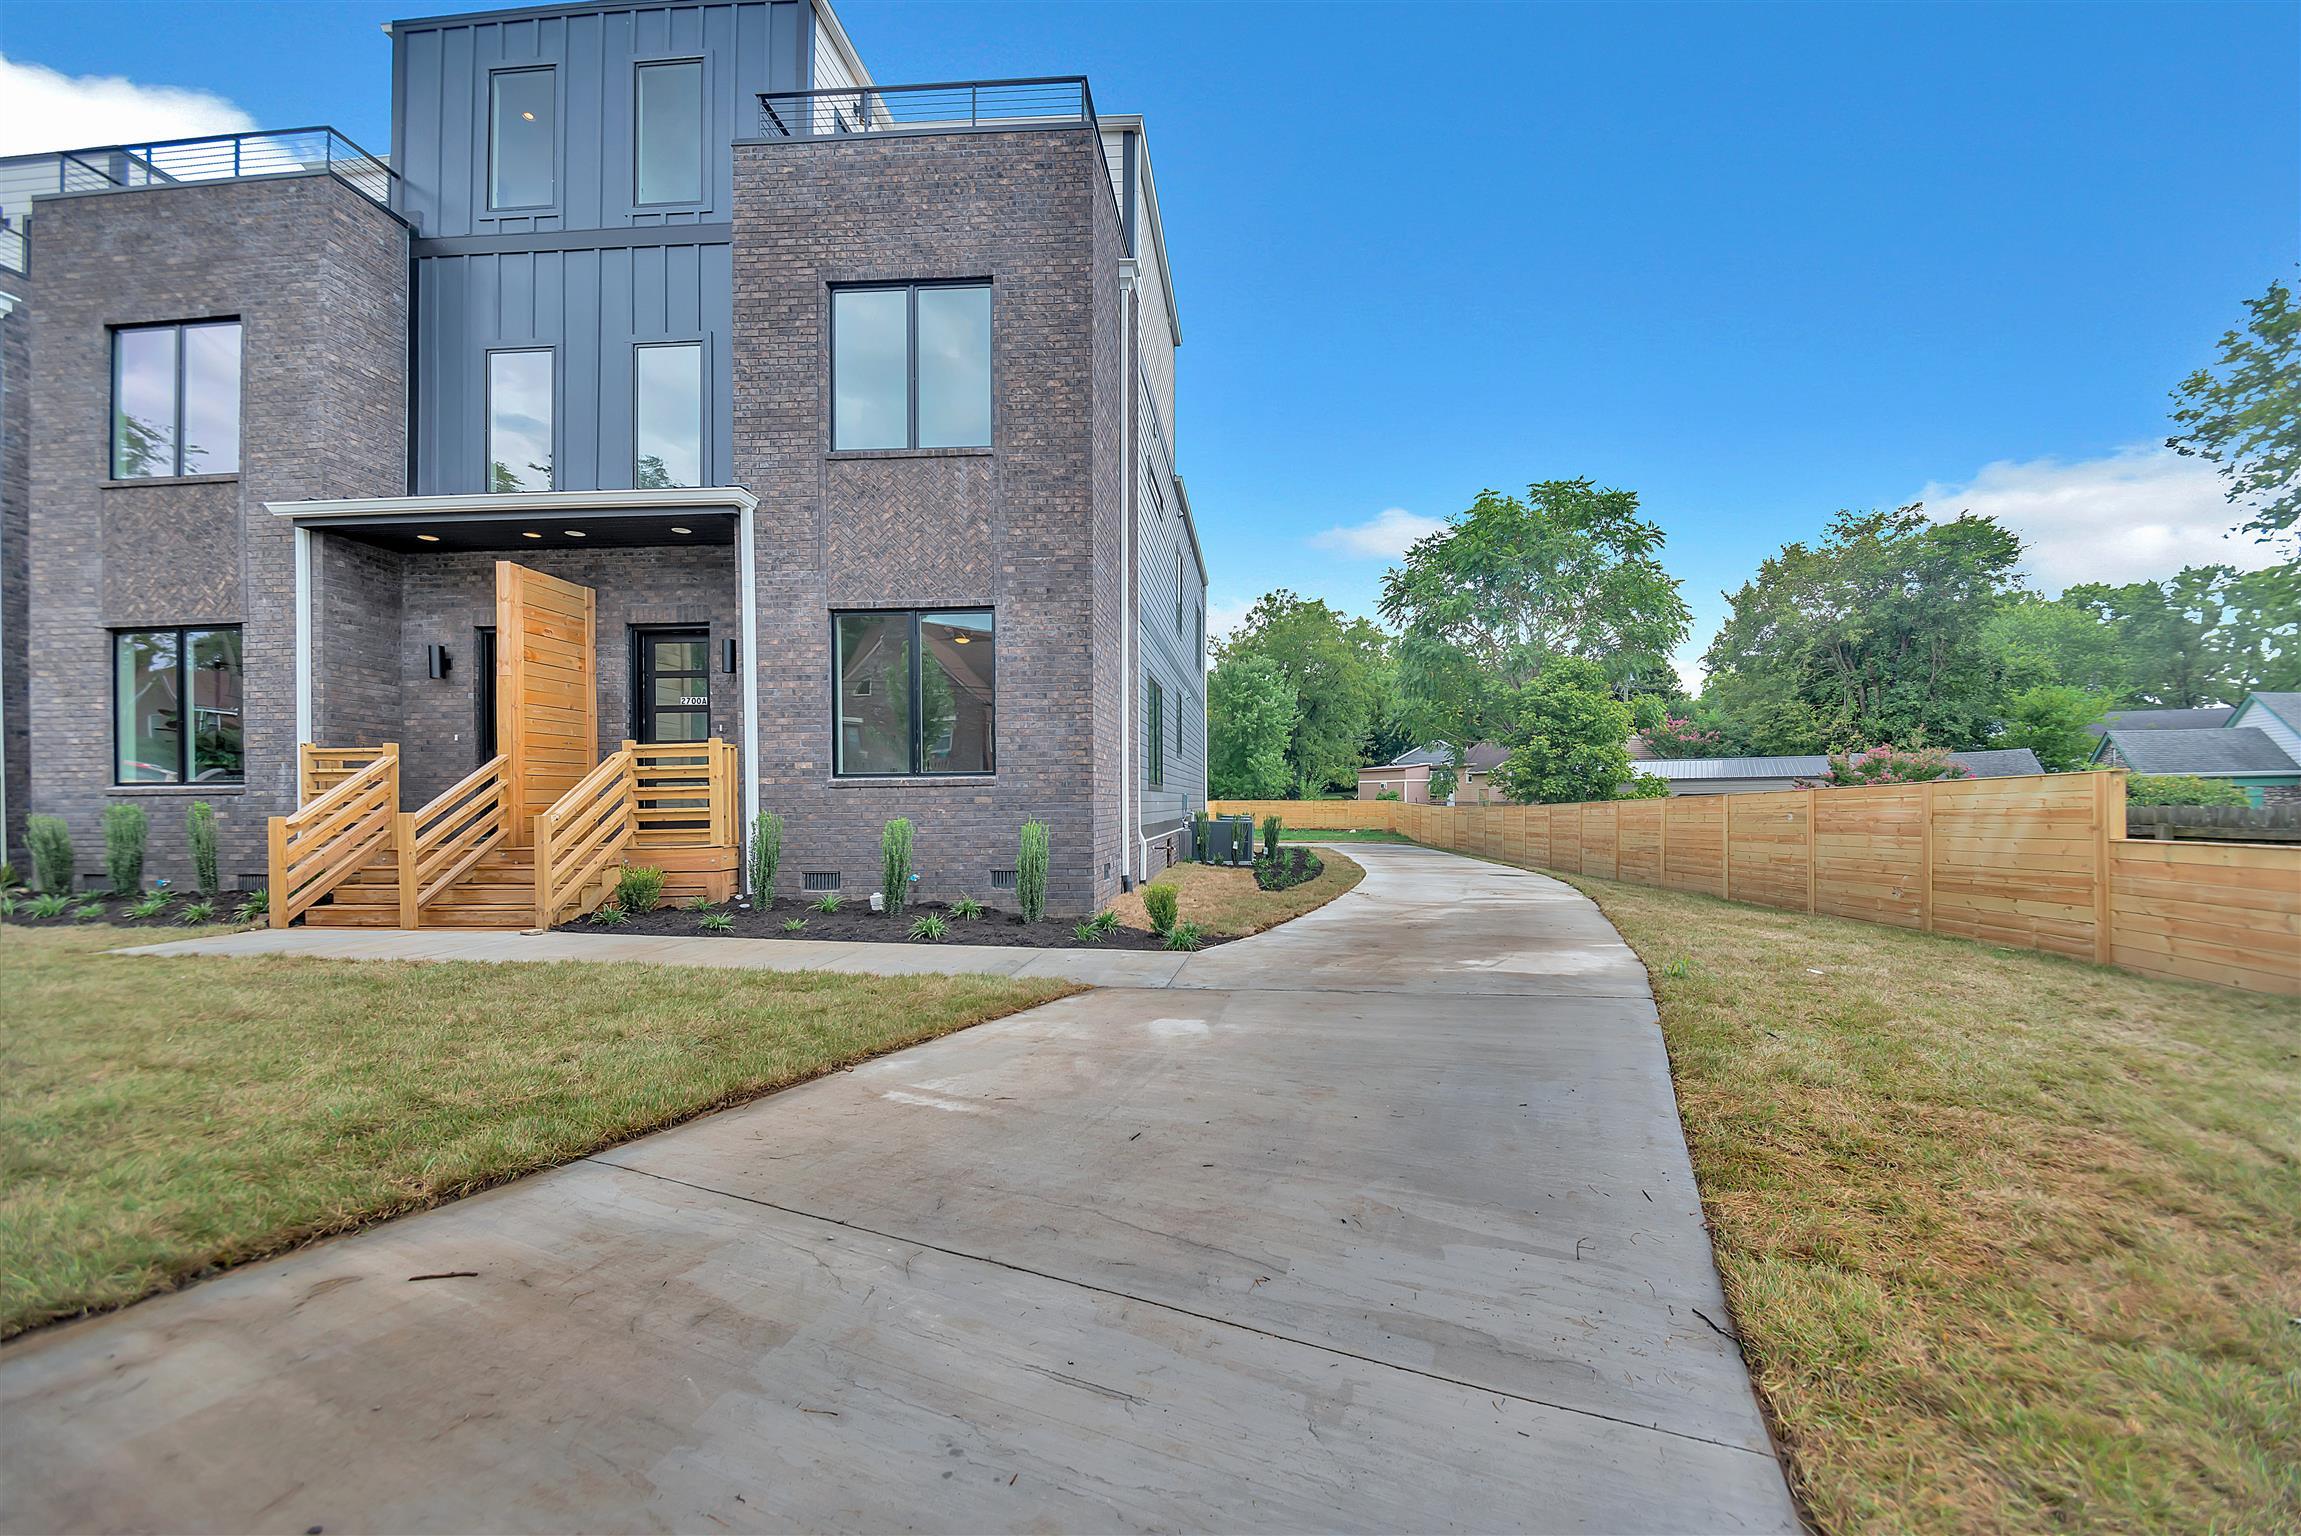 2700A Bronte, Nashville, TN 37216 - Nashville, TN real estate listing